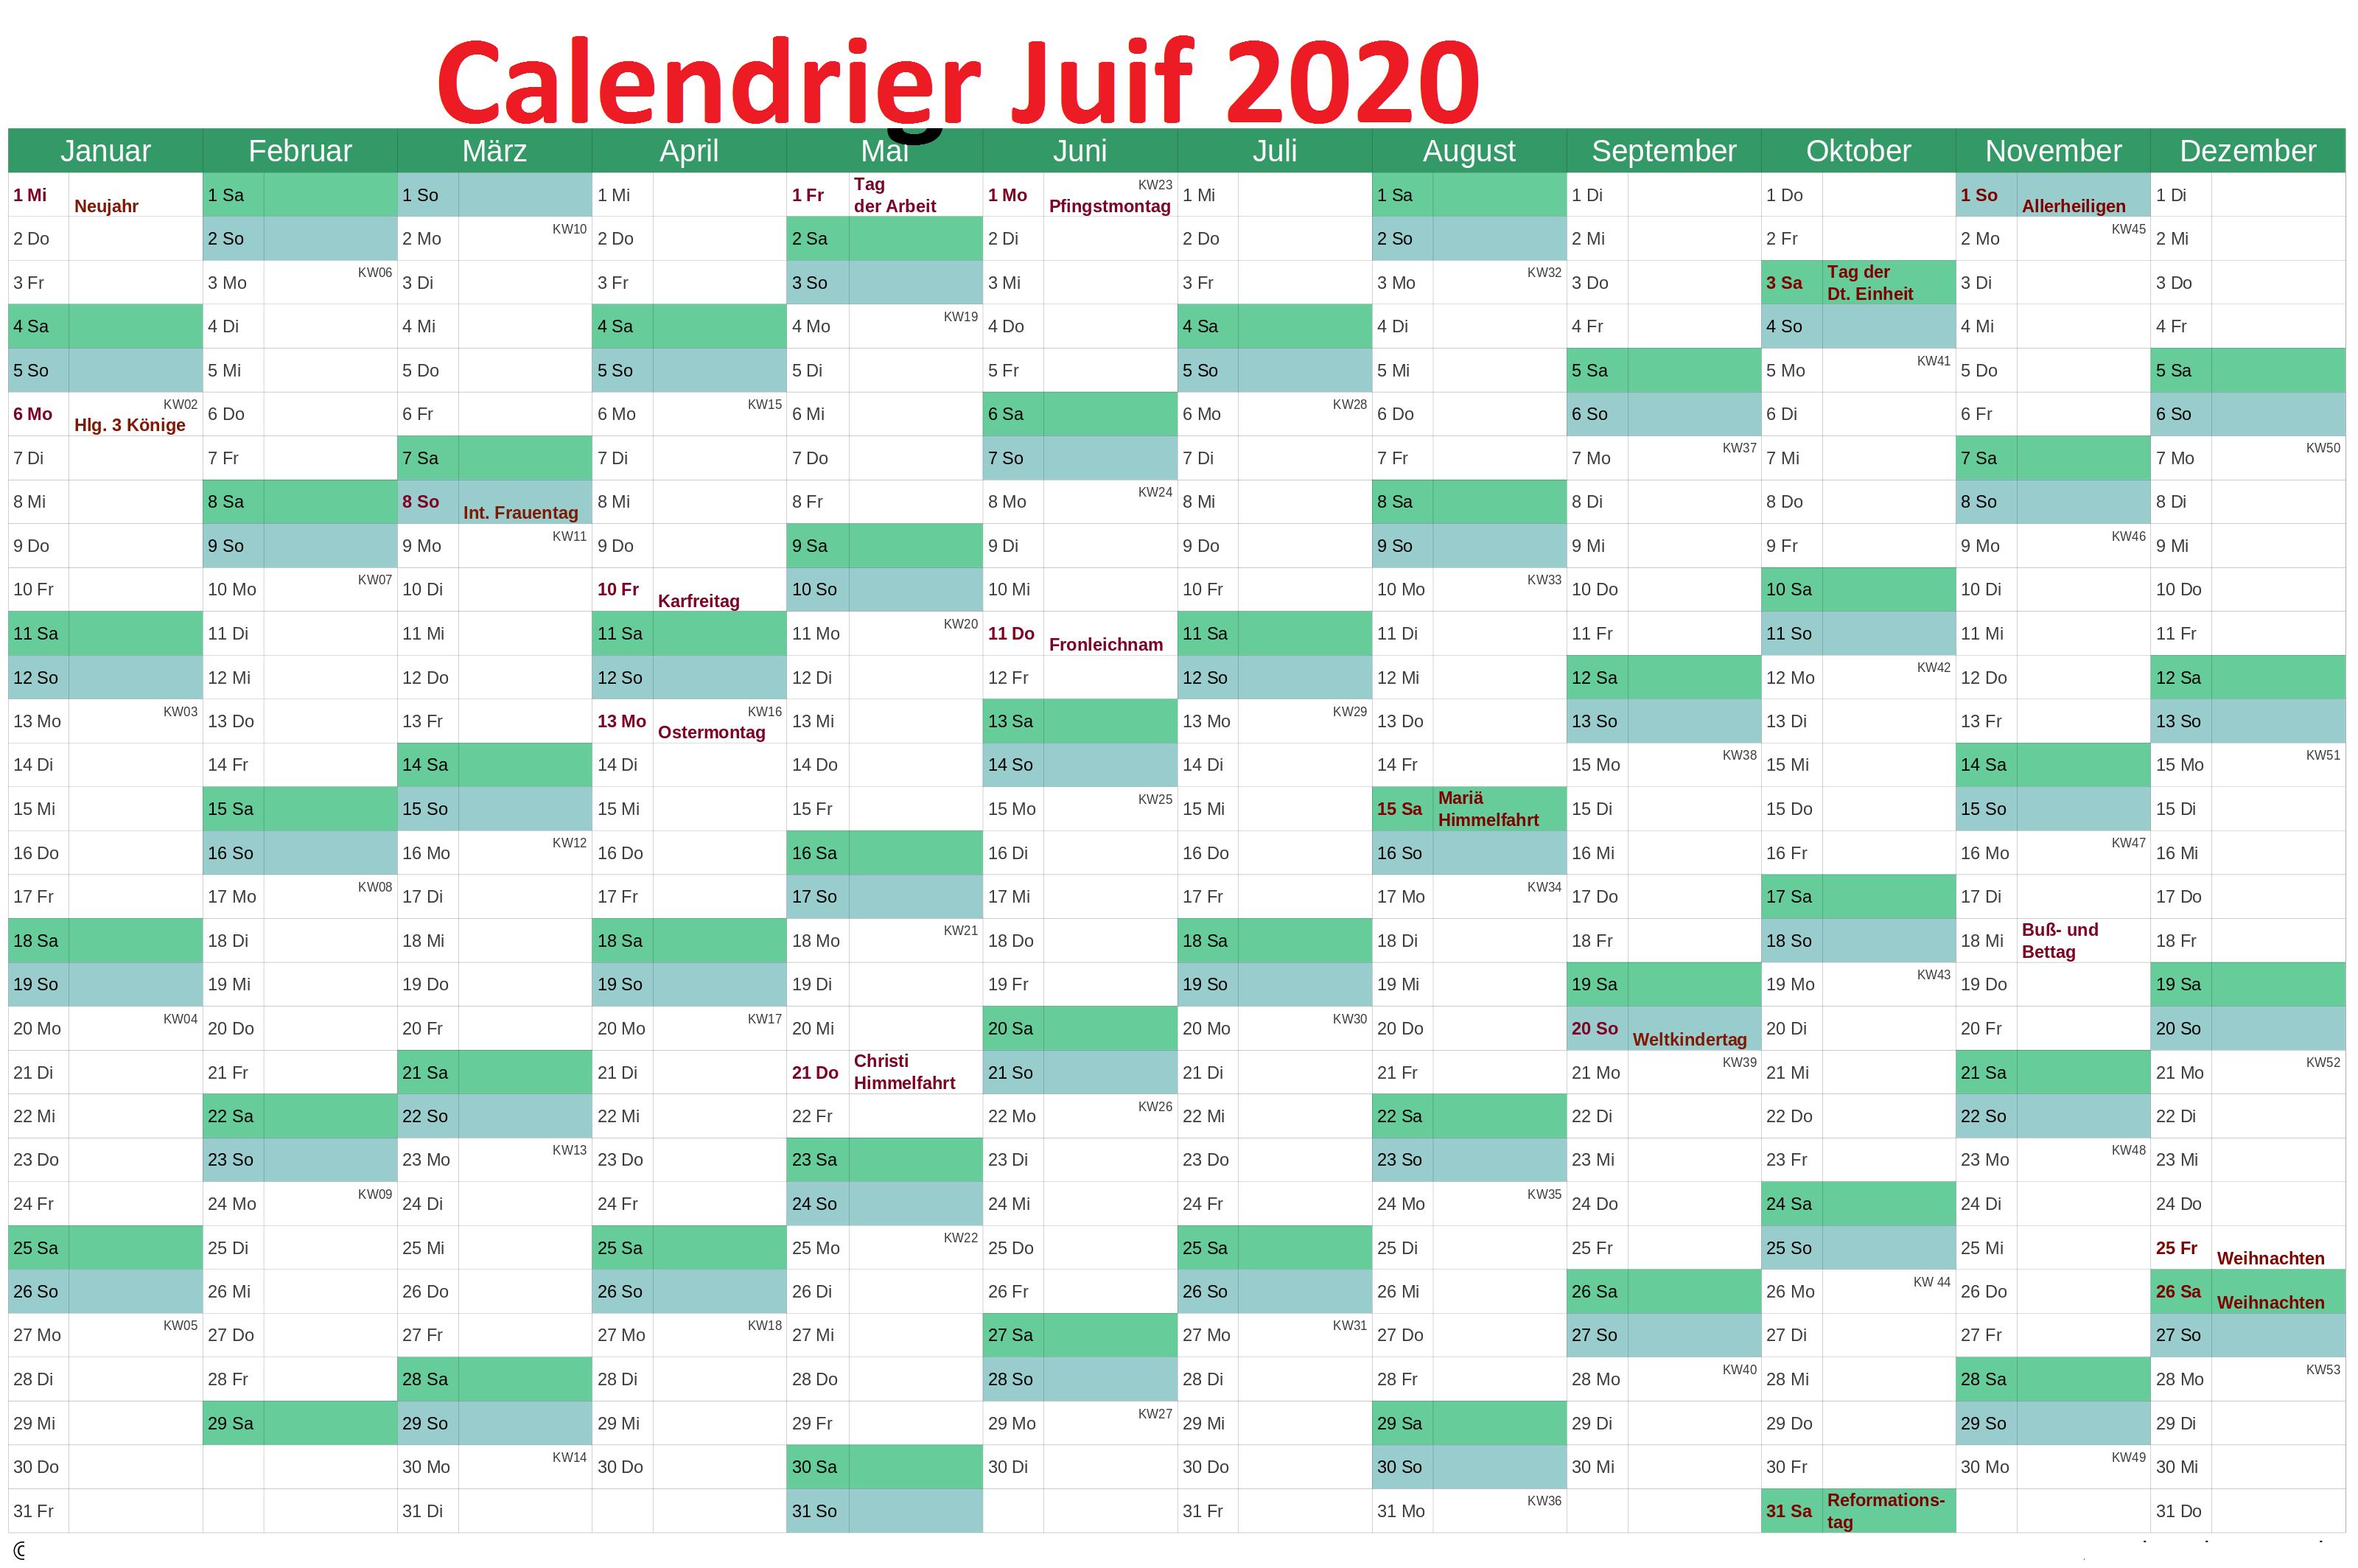 calendrier juif 2020